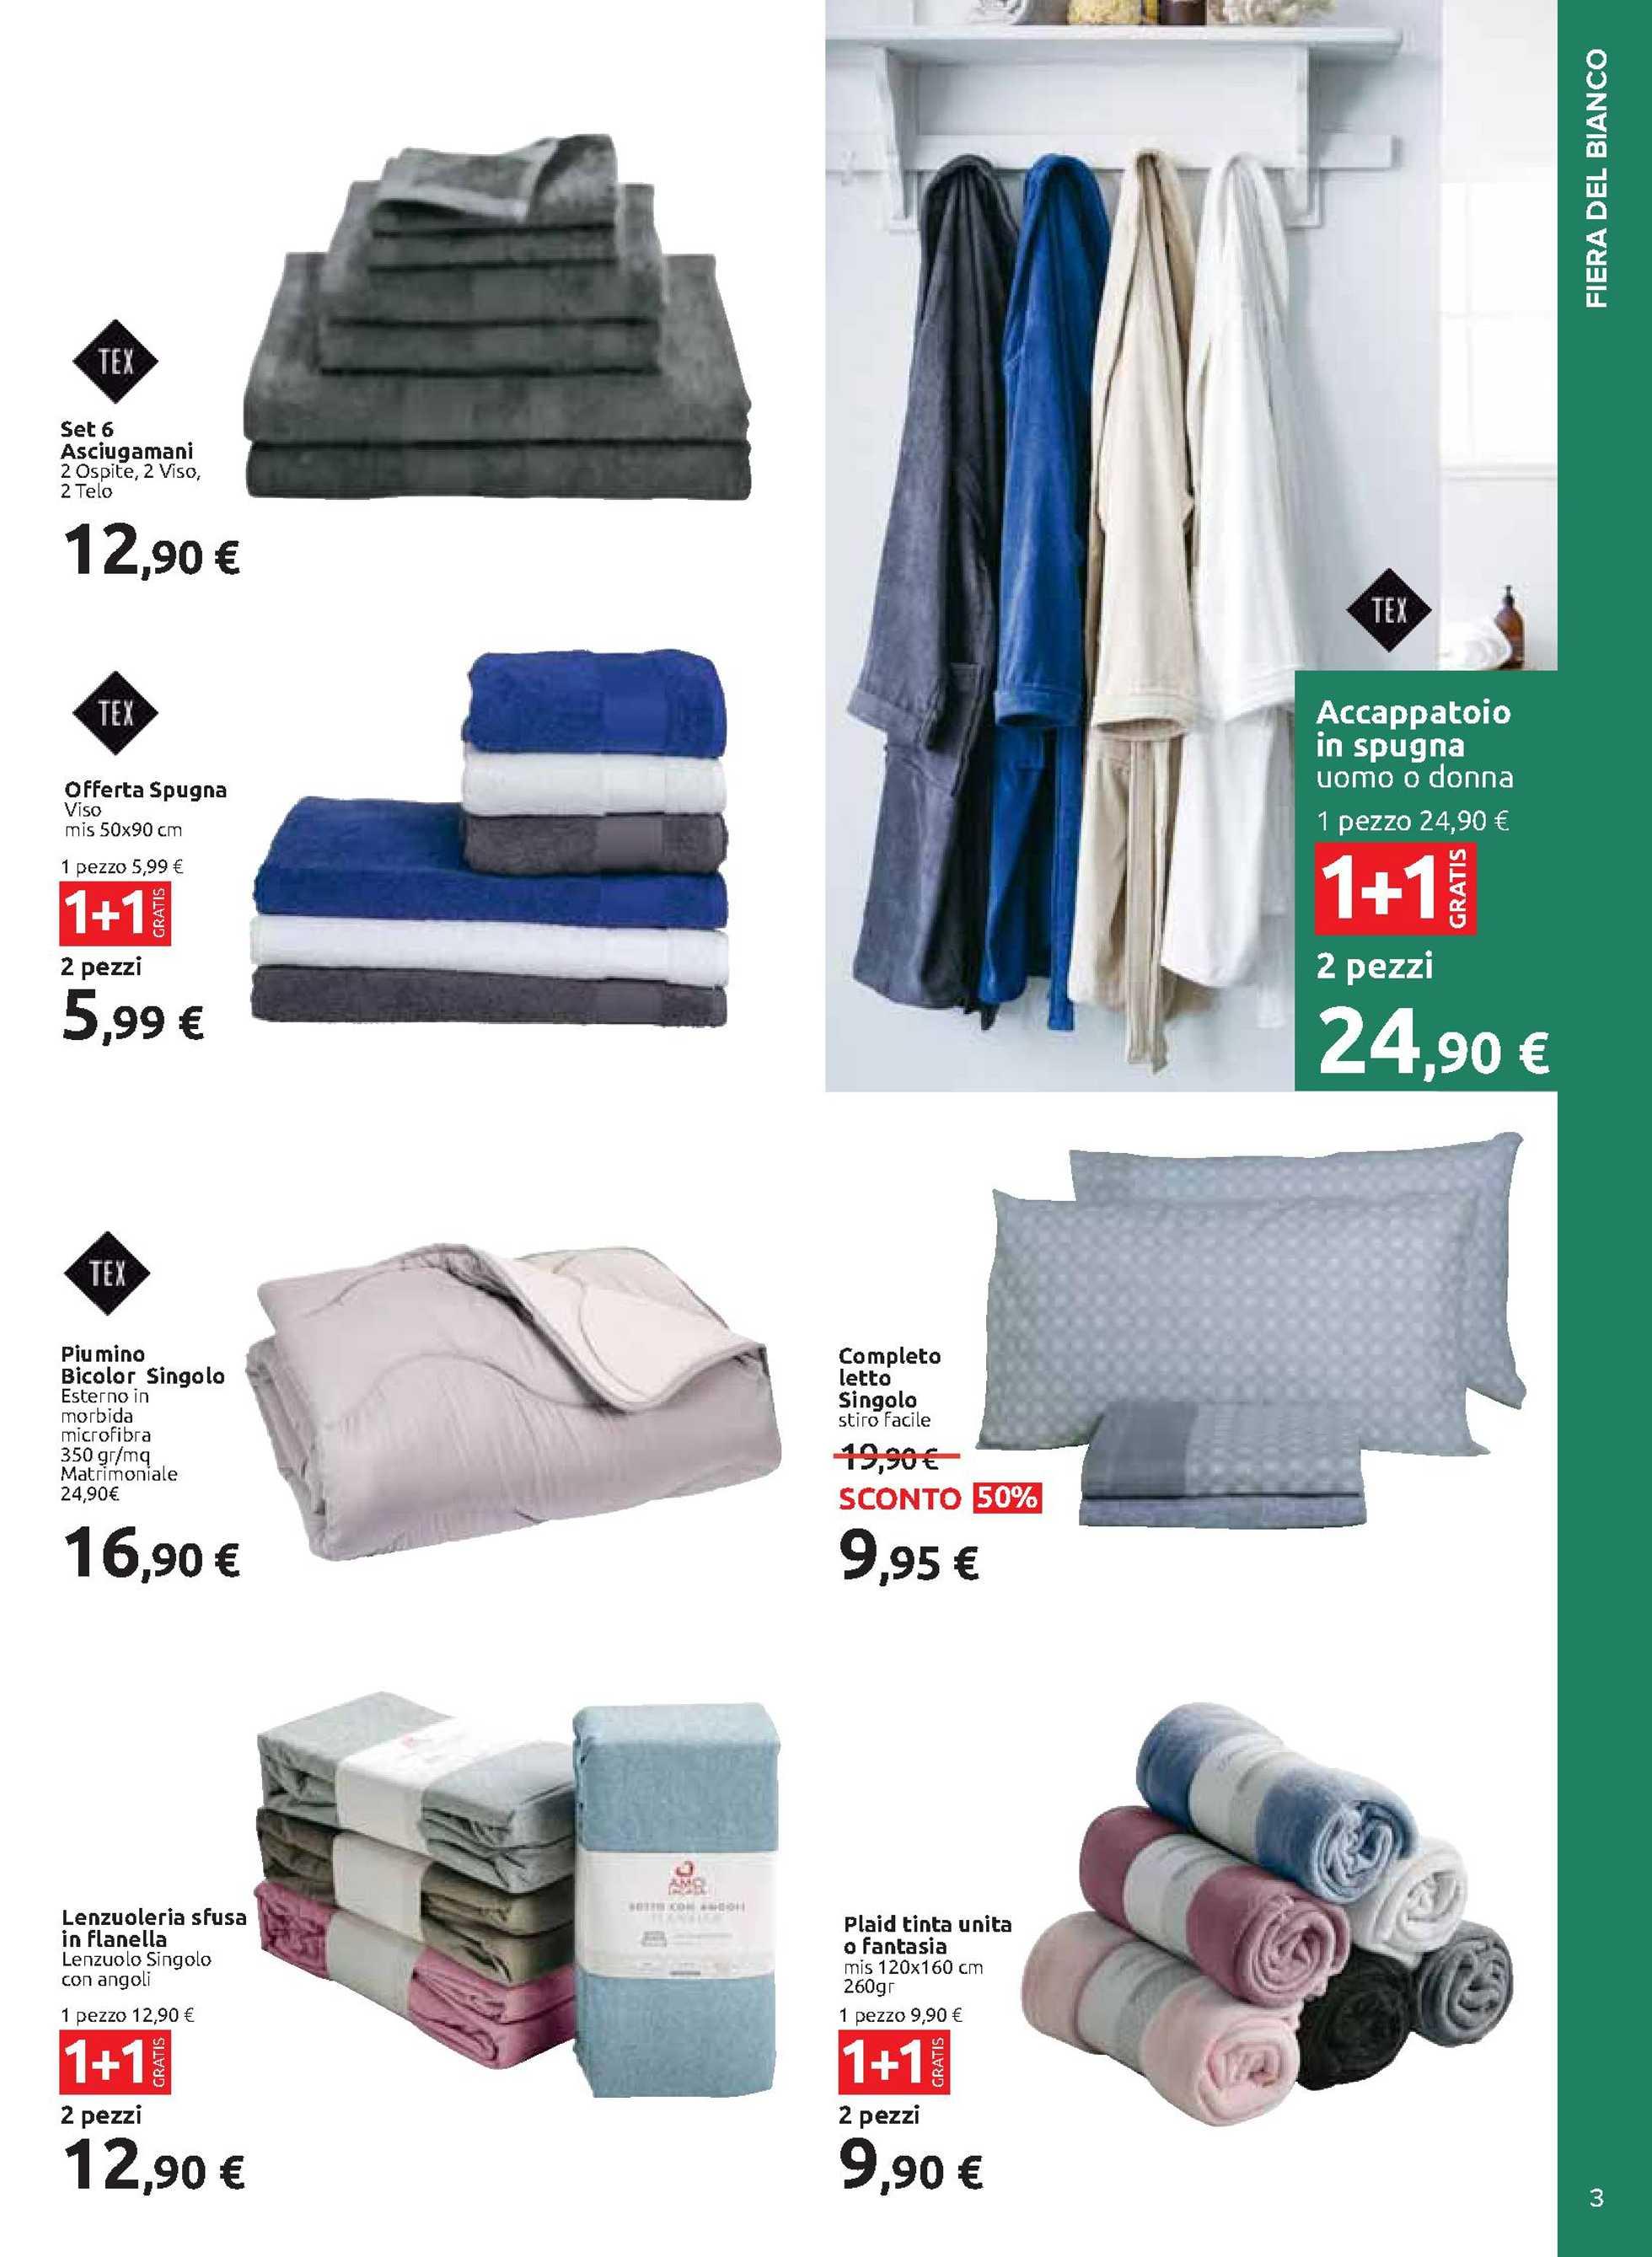 Carrefour Iper - offerte valide dal 28.12.2020 al 24.01.2021 - pagina 3.